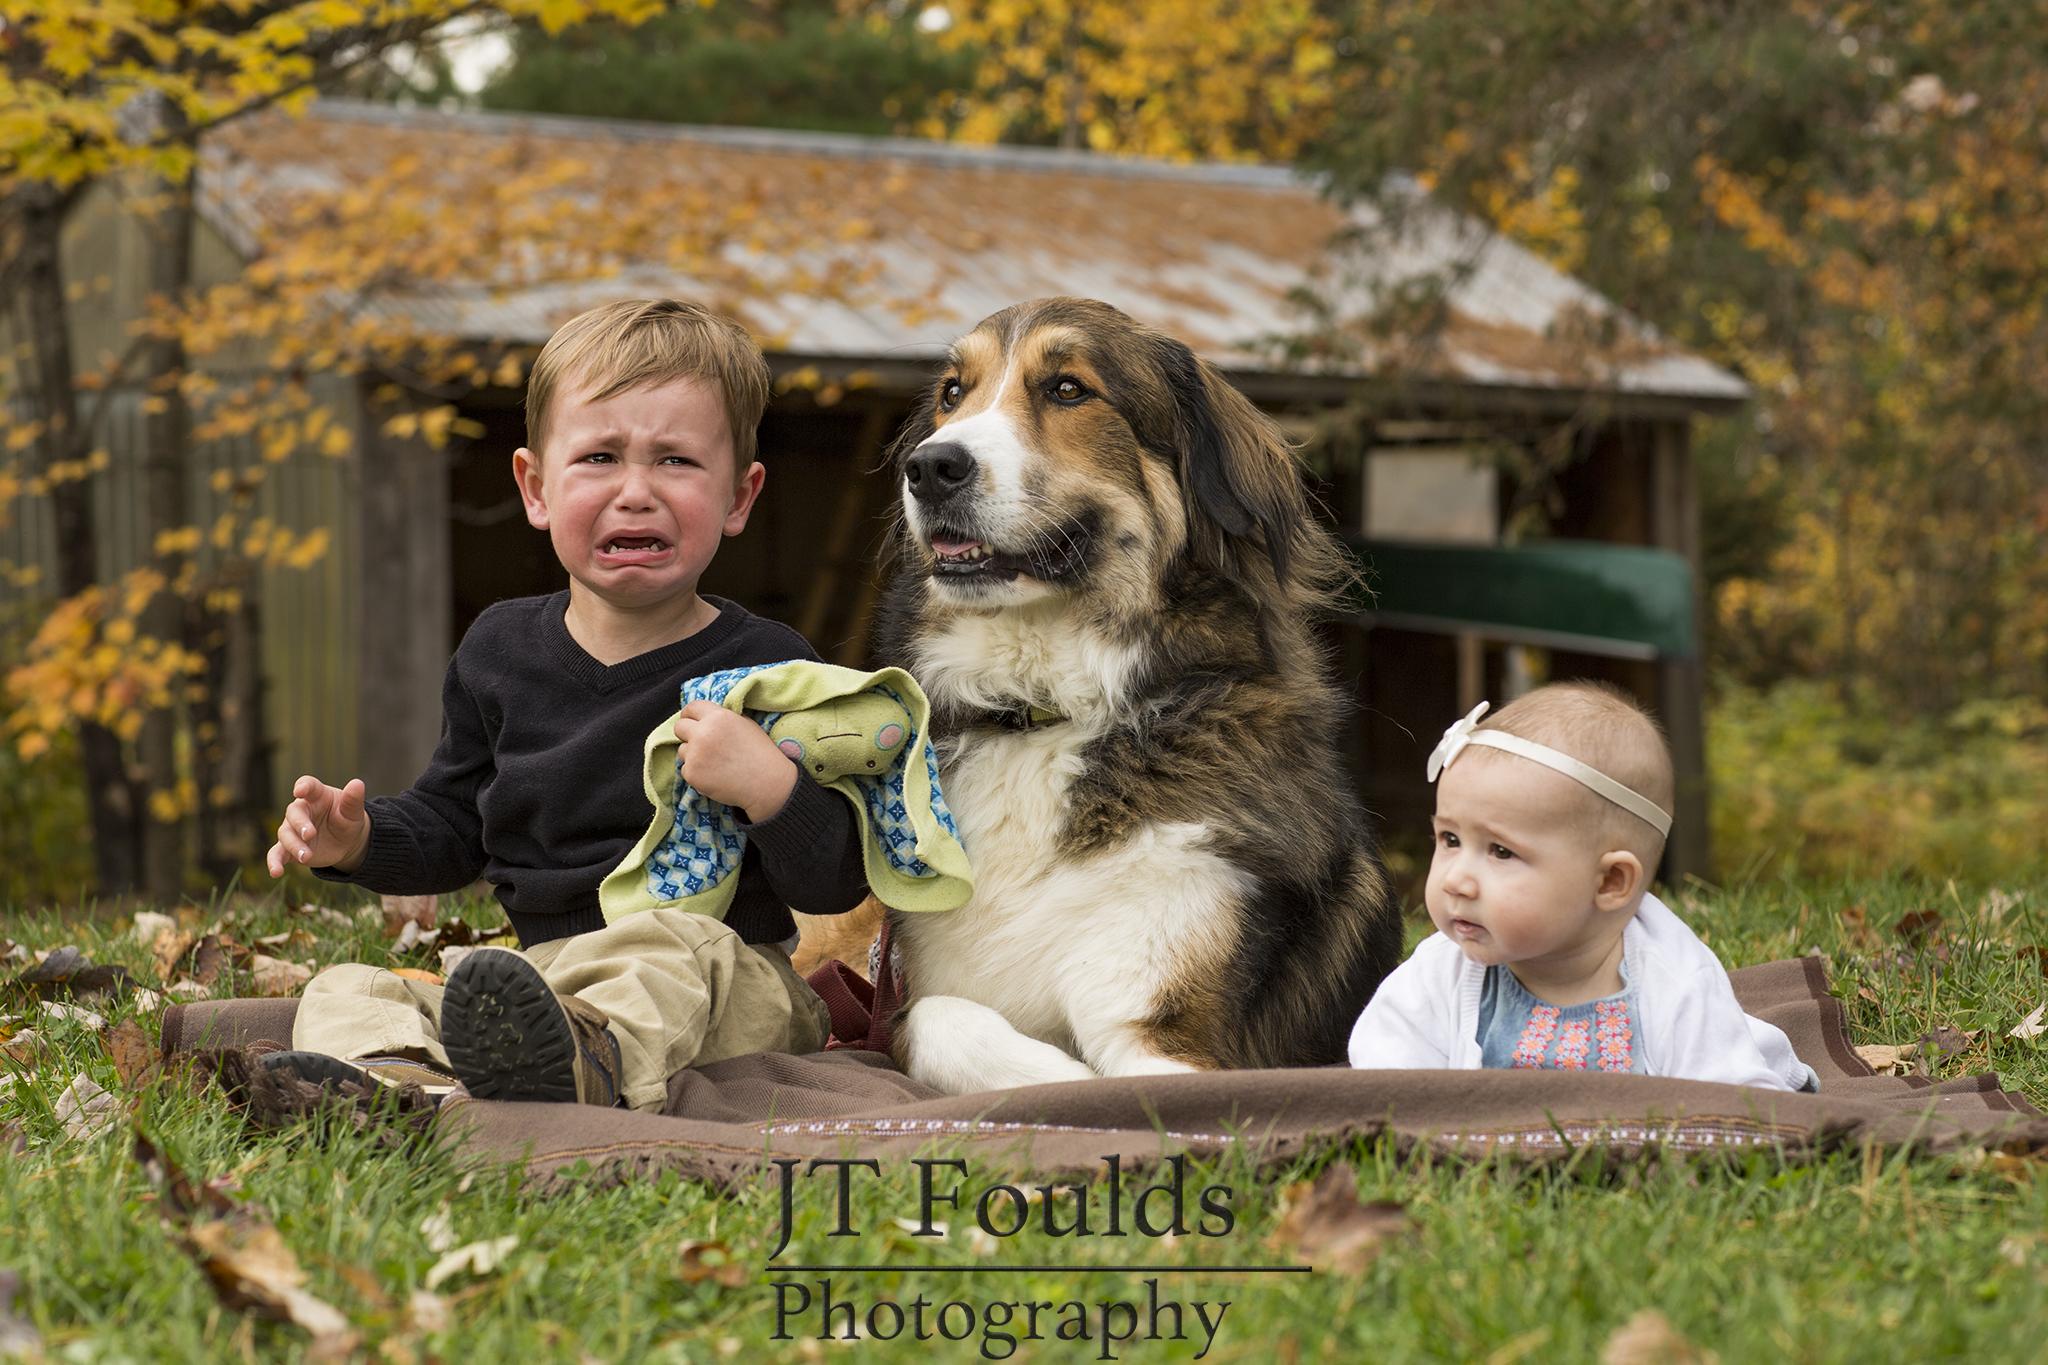 21 Oct '17 - JT.Foulds©2017